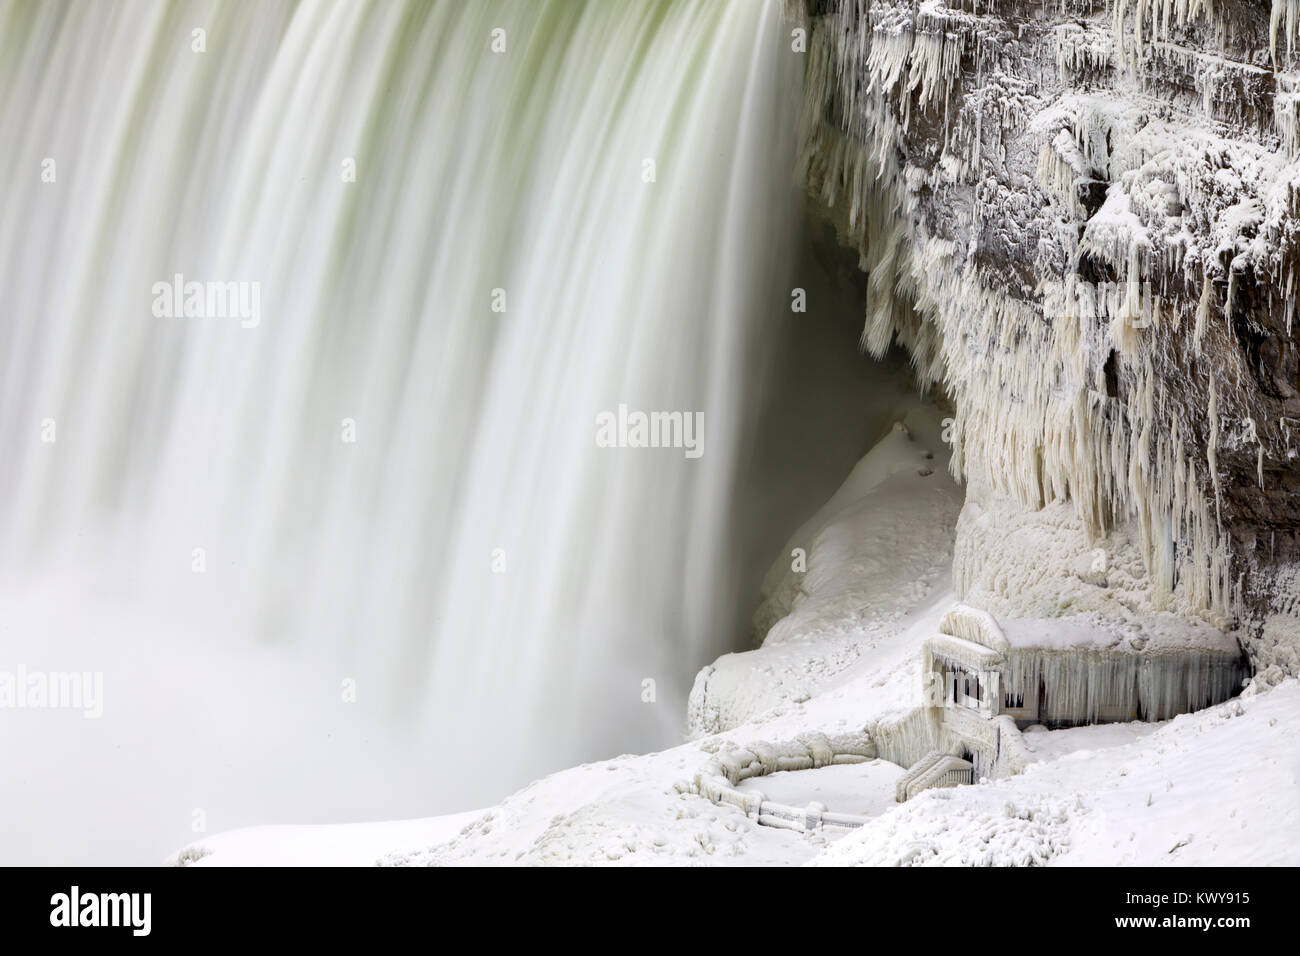 Niagara Falls Ice Studies Jan 2018 Stock Photo 170859505